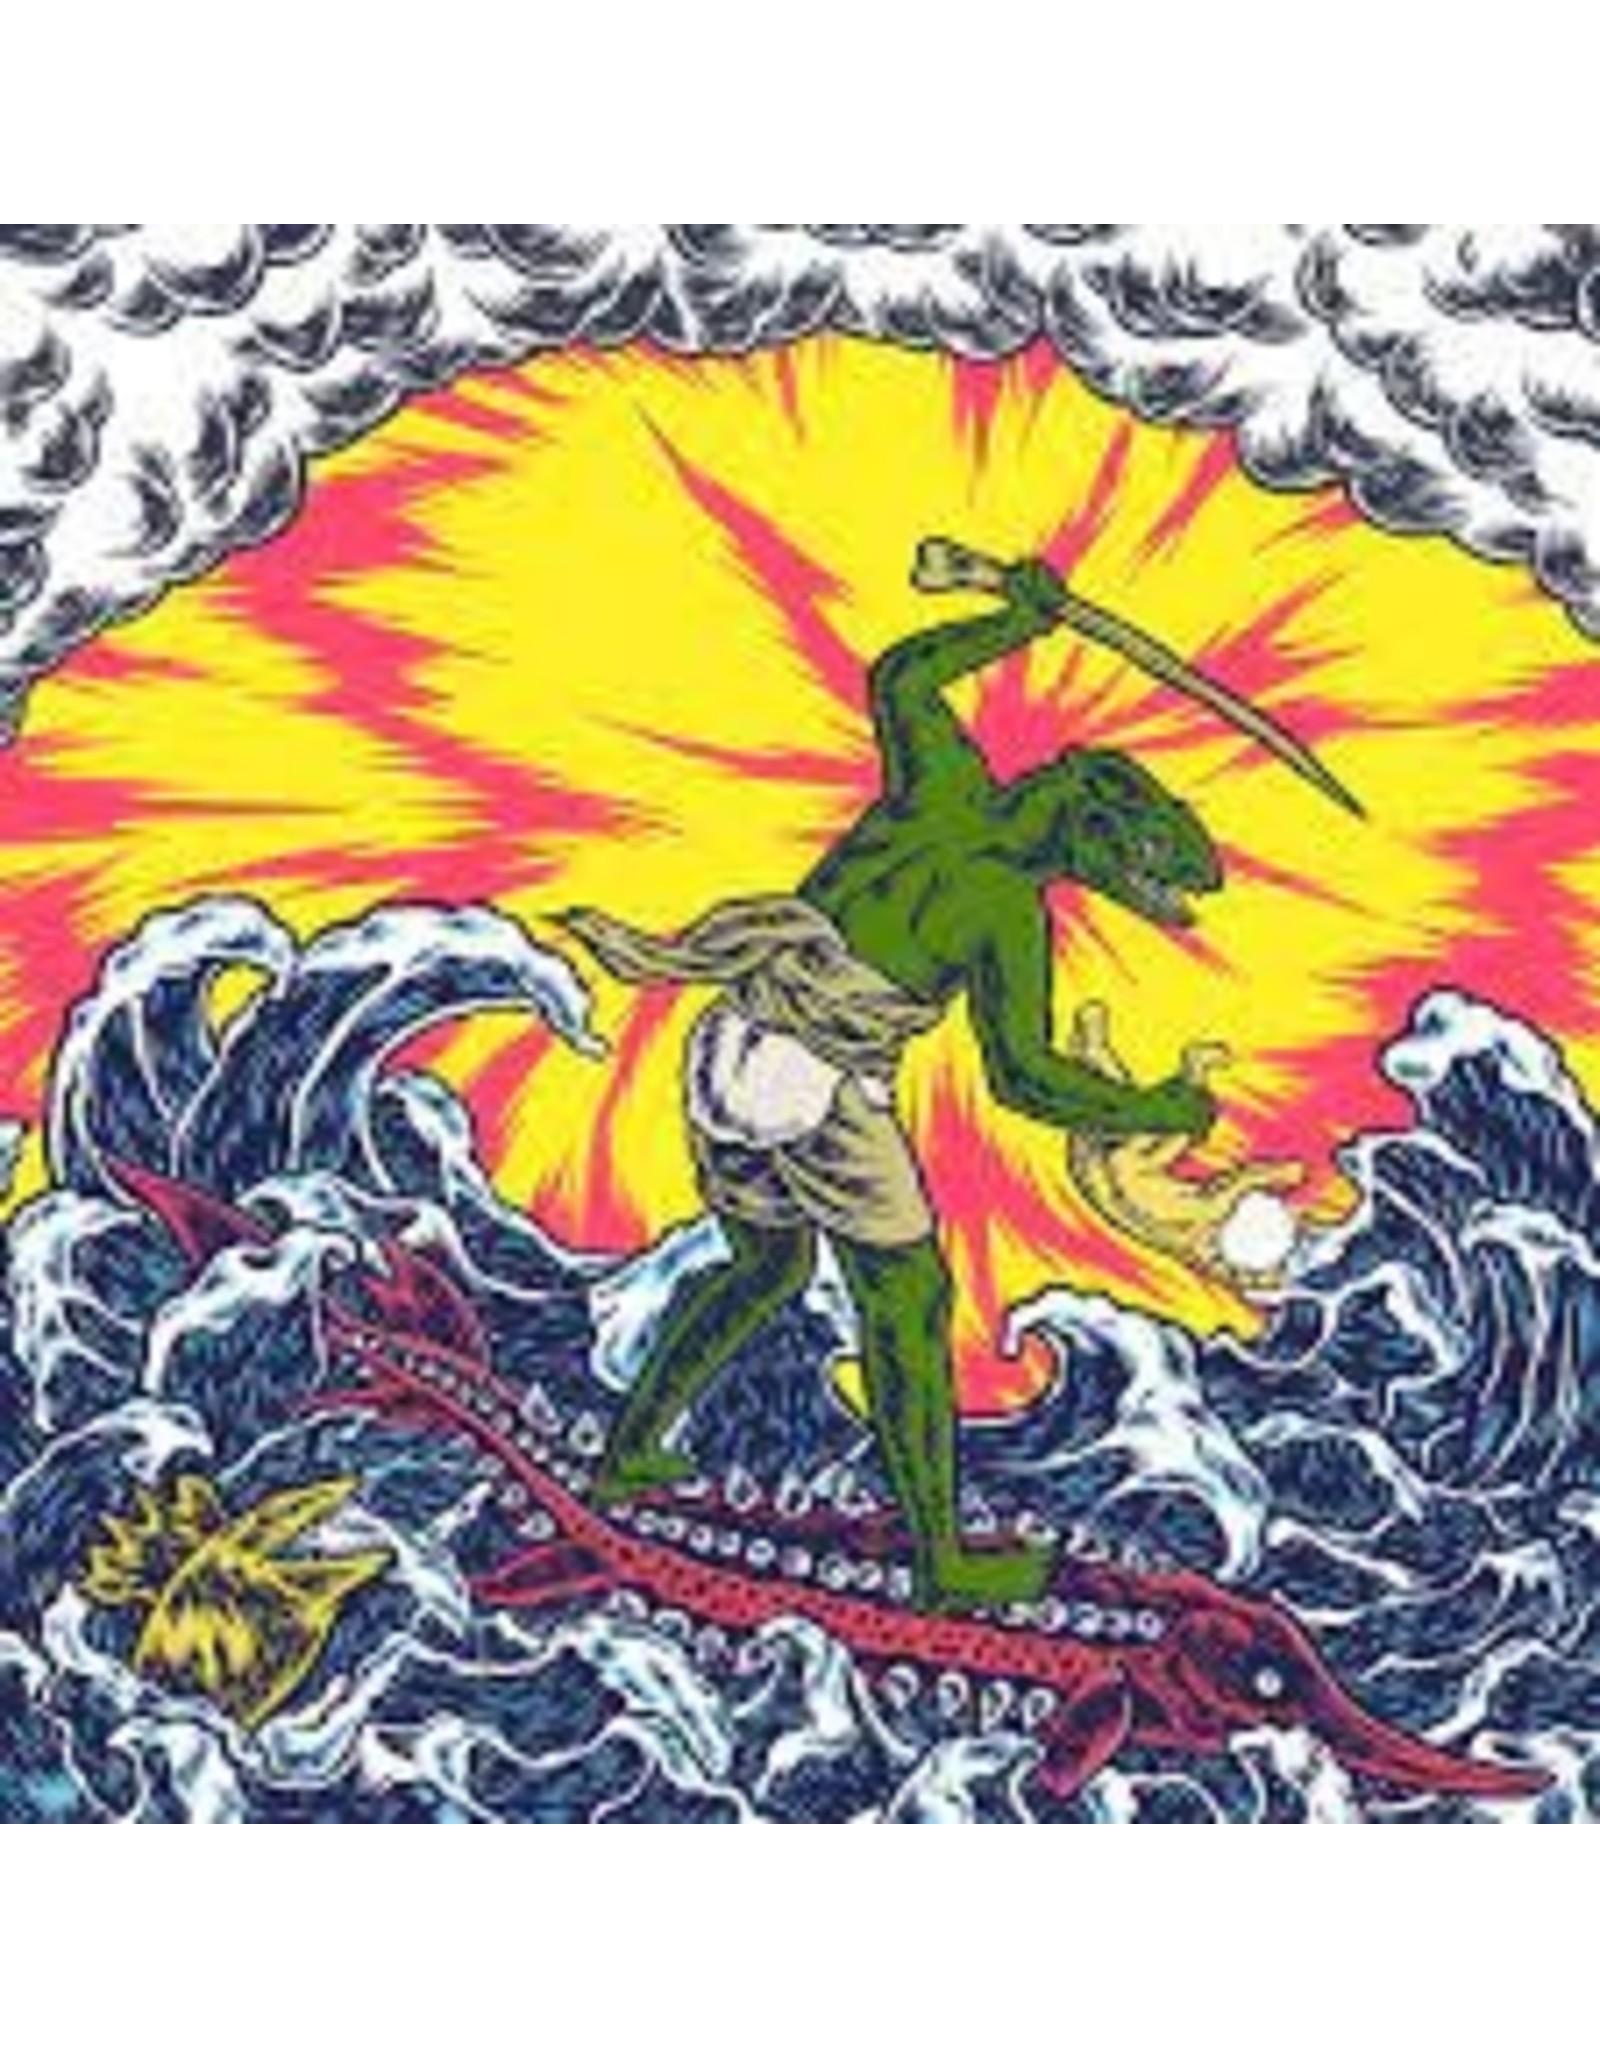 King Gizzard - Teenage Gizzard LP